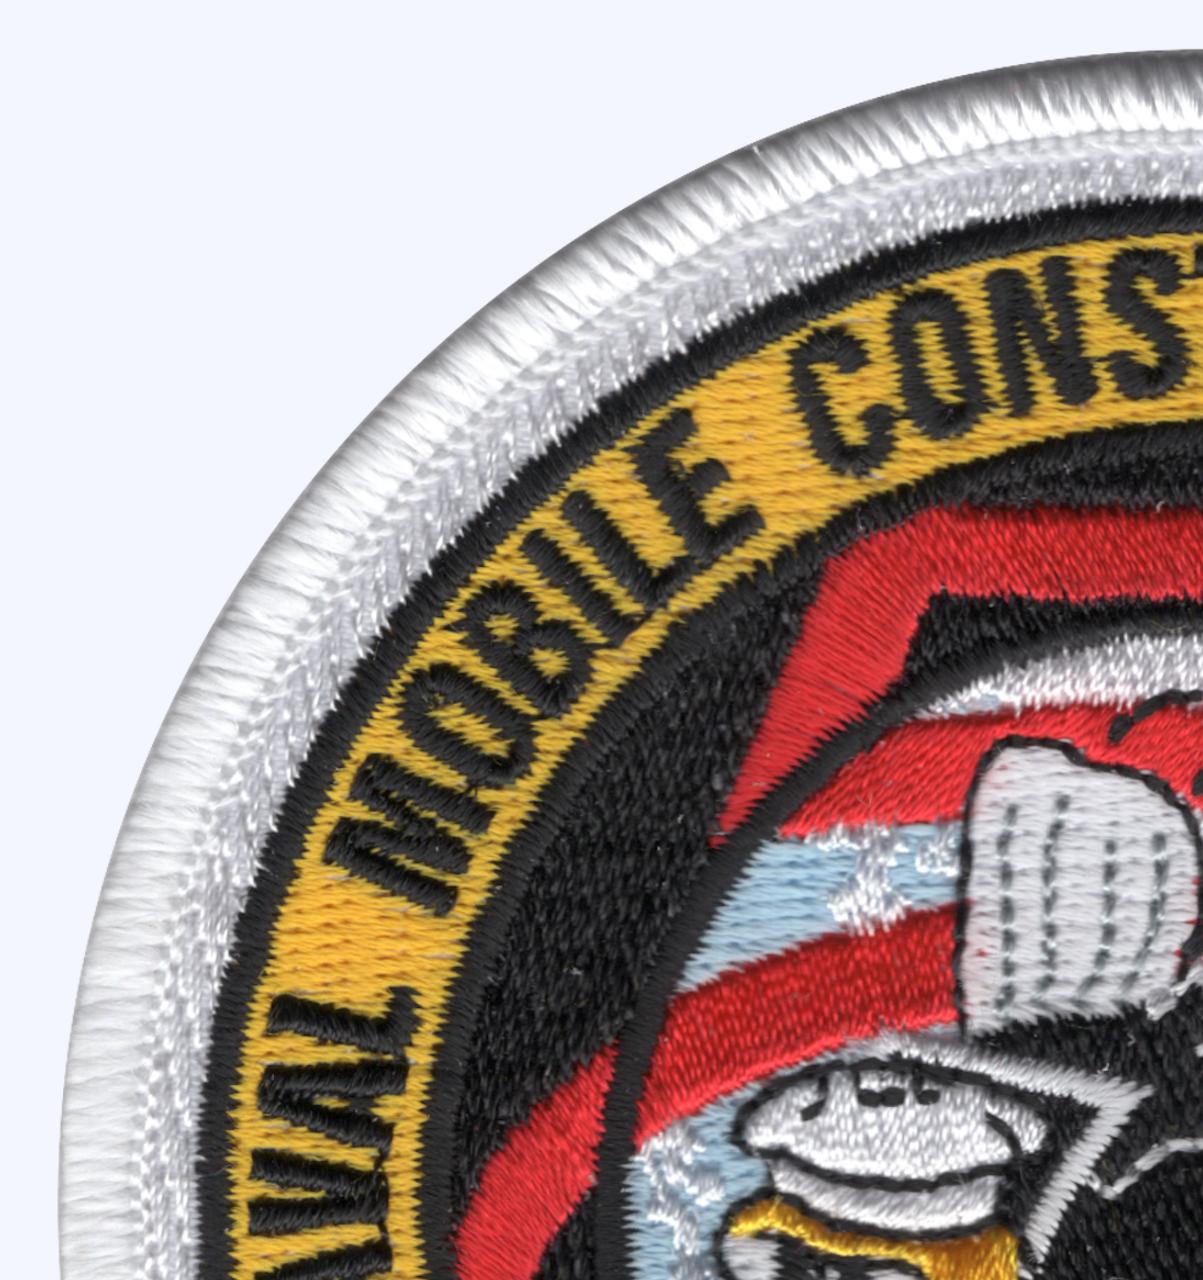 5th Mobile Construction Battalion The Professionals Patch